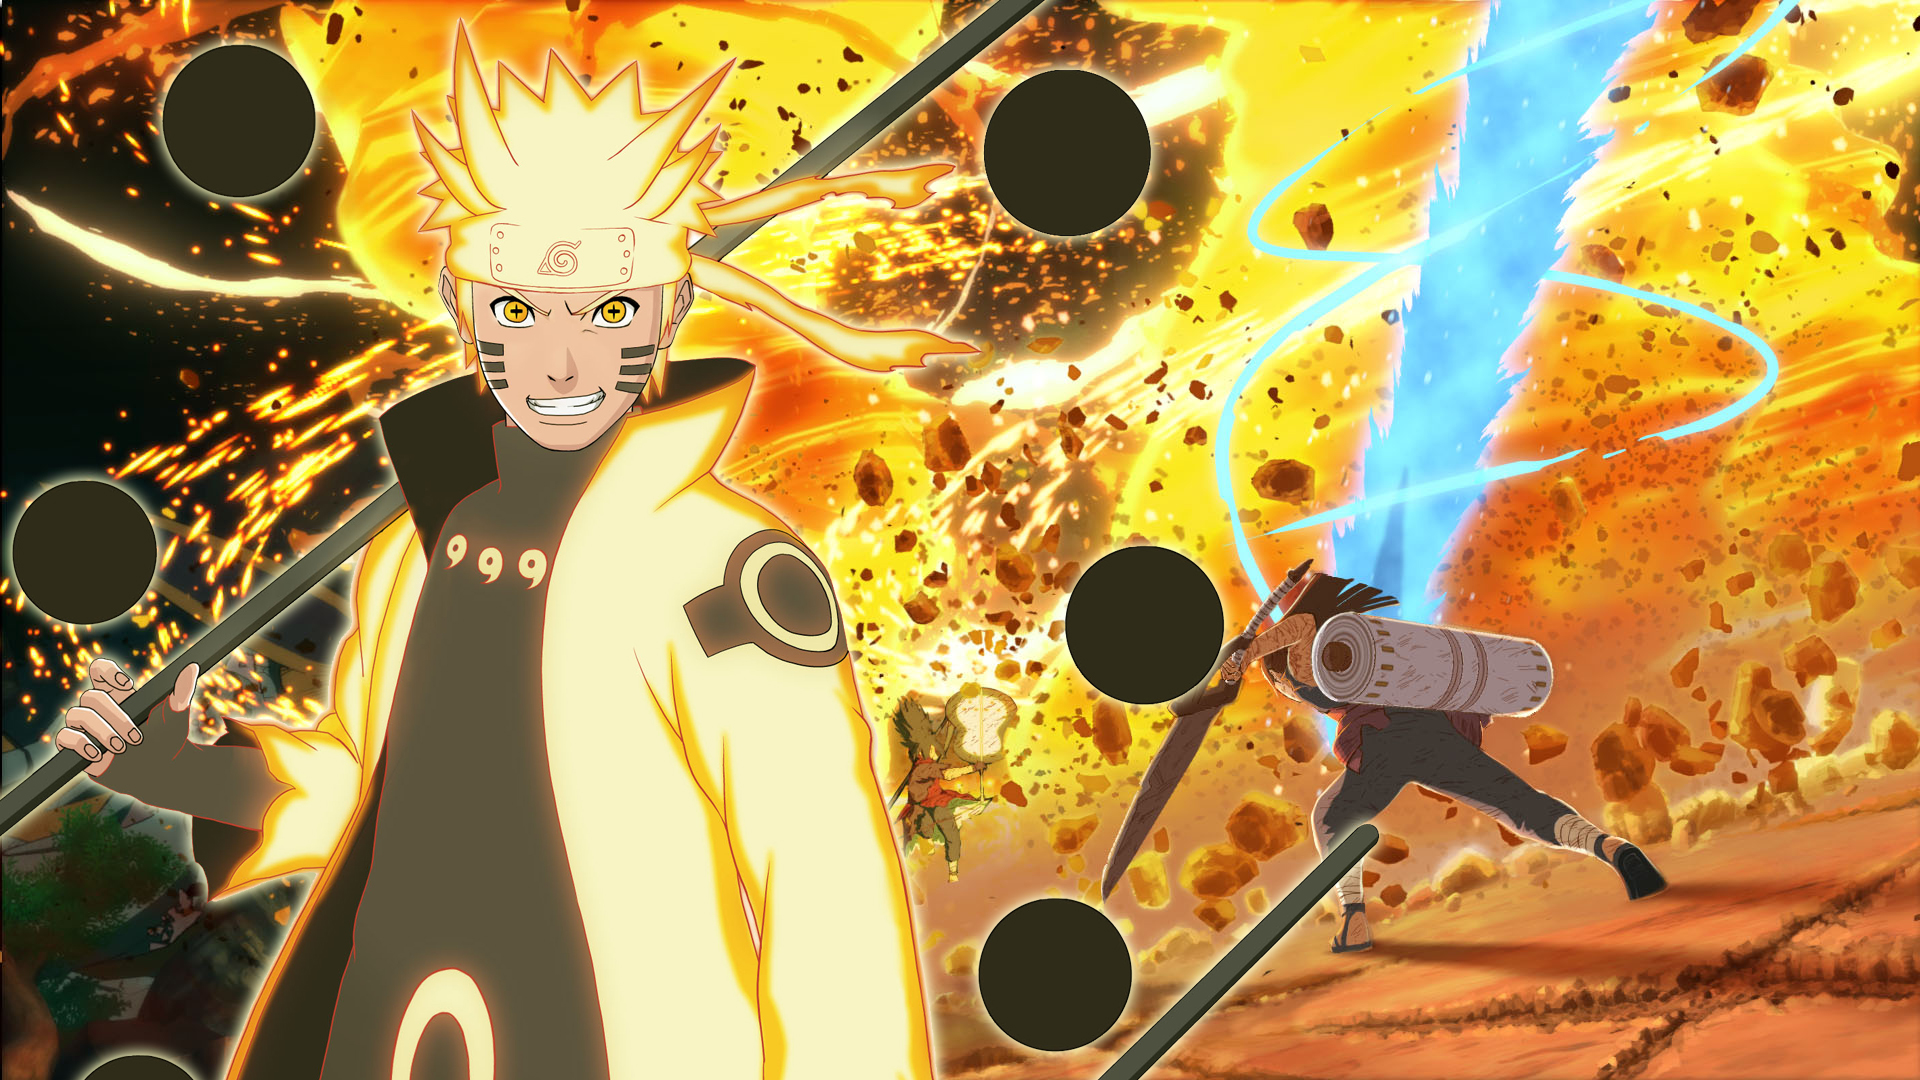 Naruto Shippuden Wallpaper Hd 44 Wallpapers – Adorable